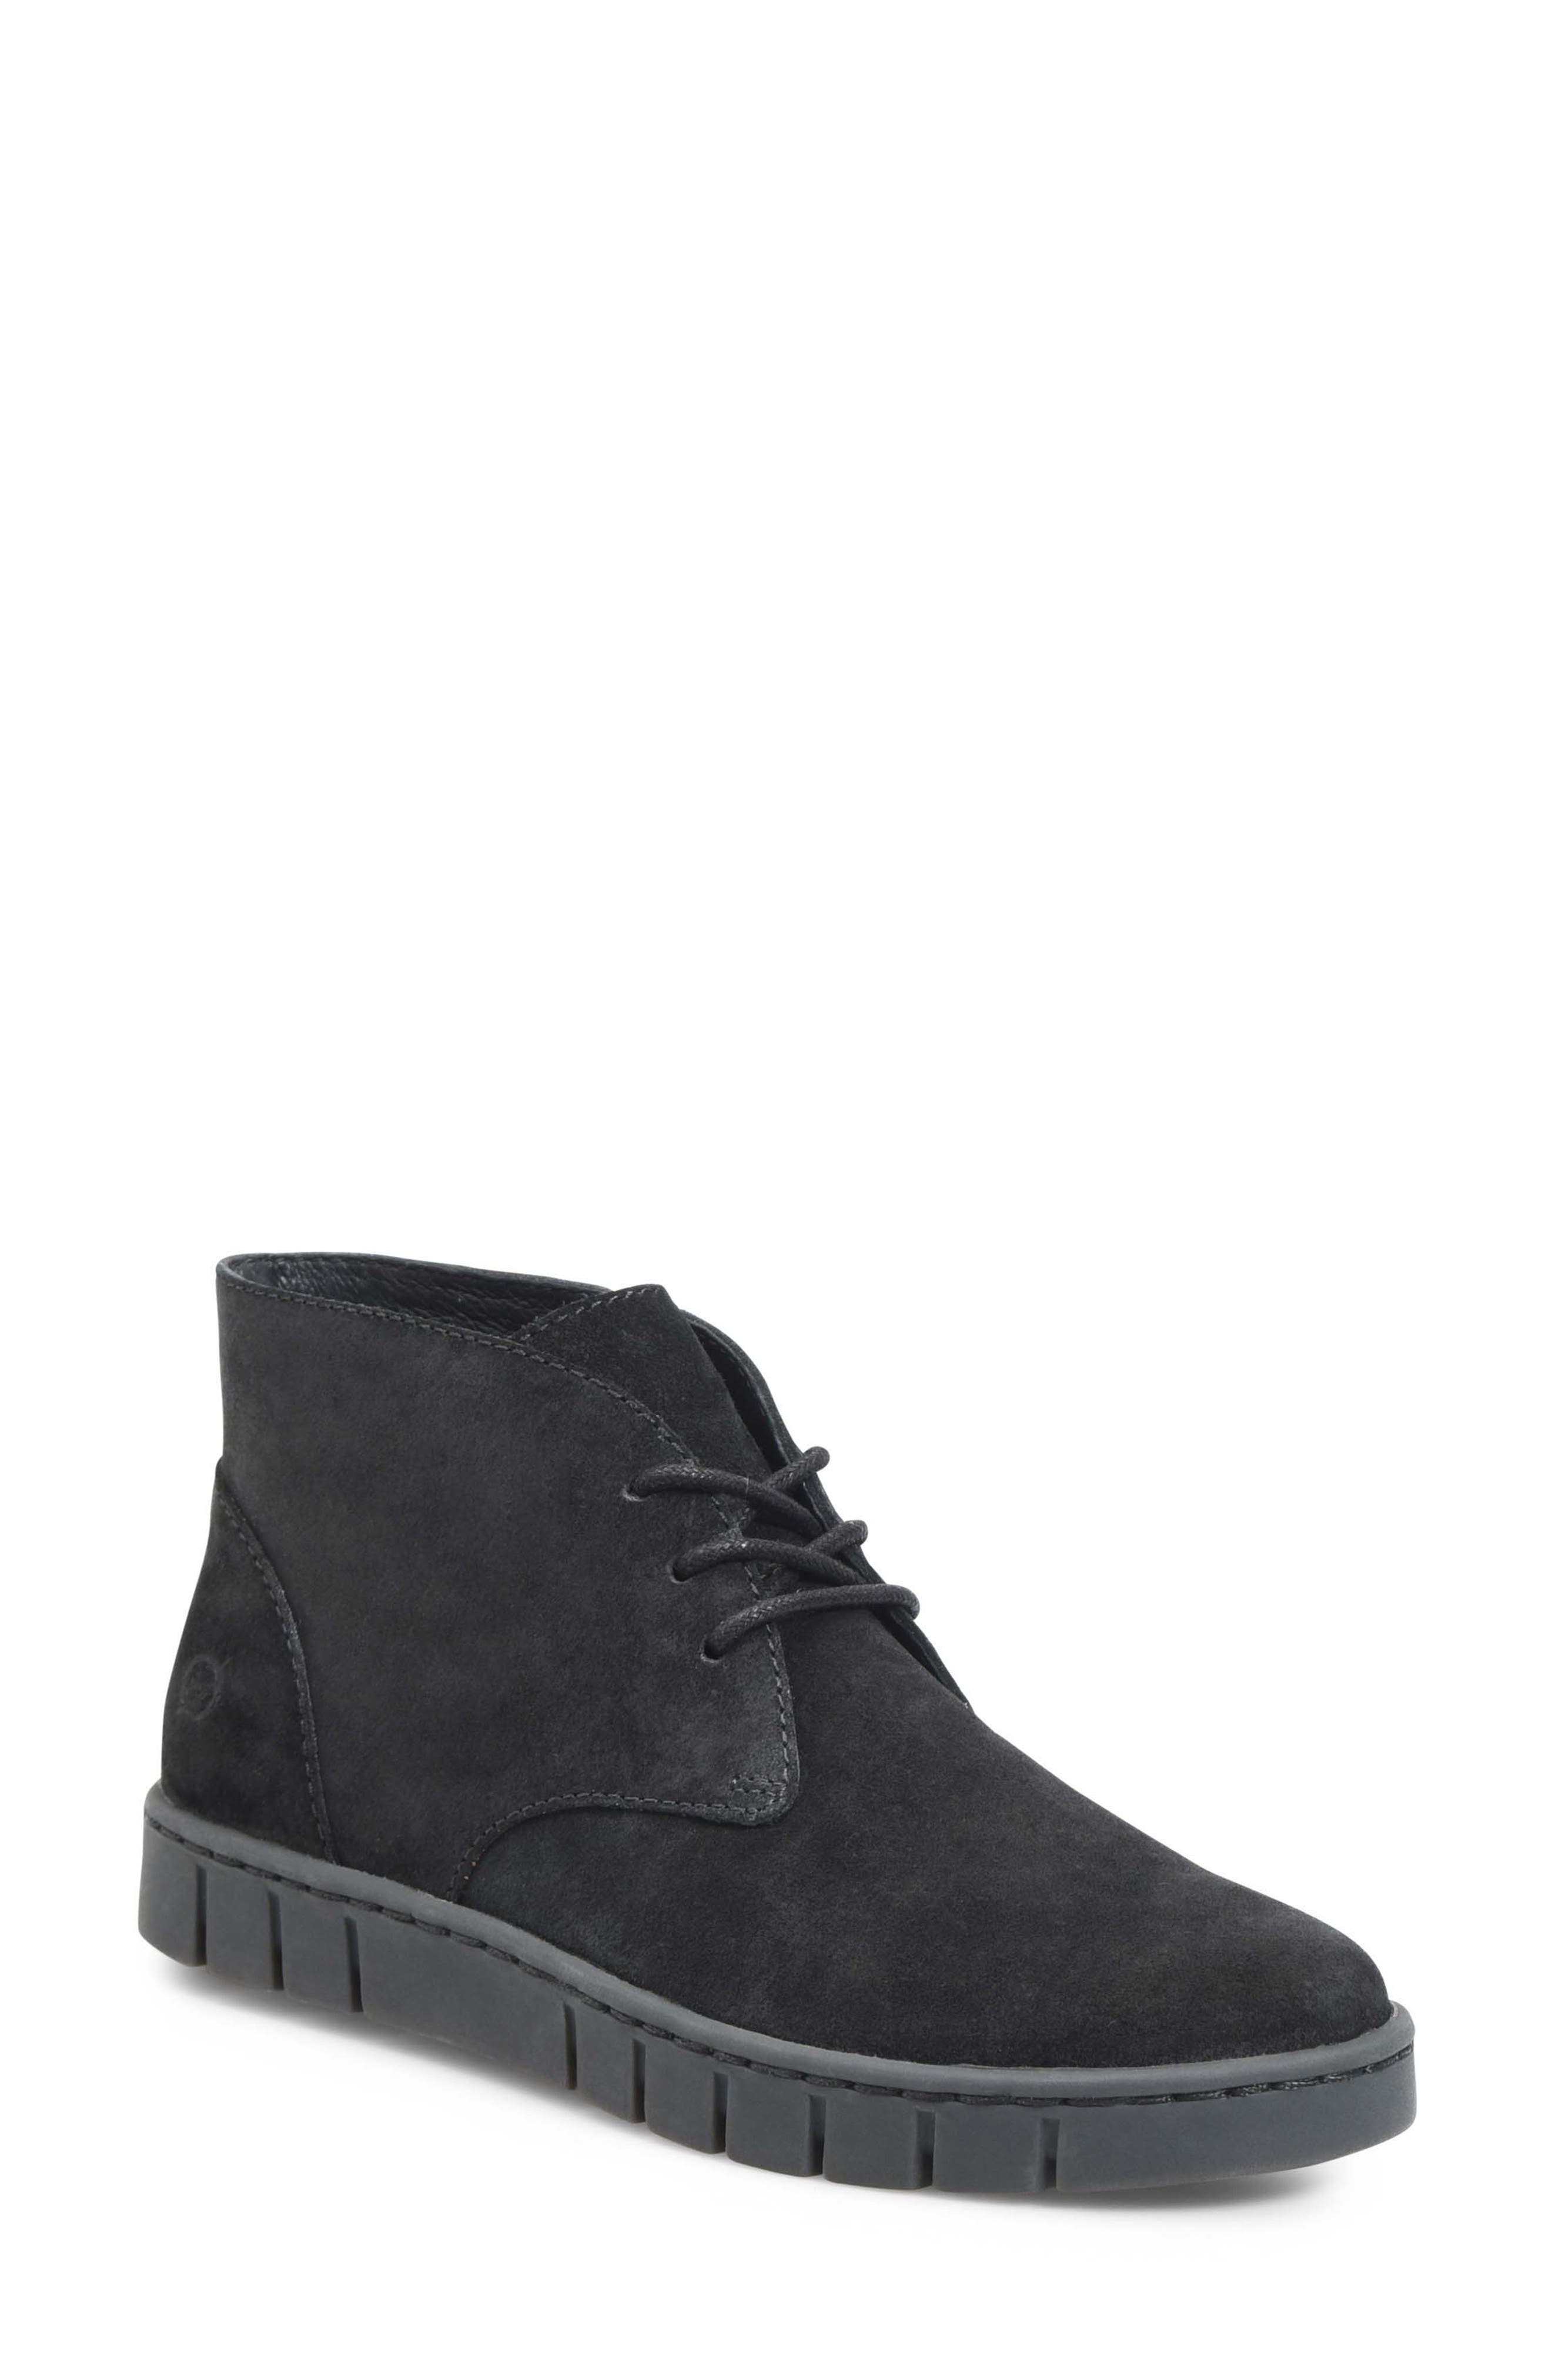 B?rn Calluna Desert Boot, Black